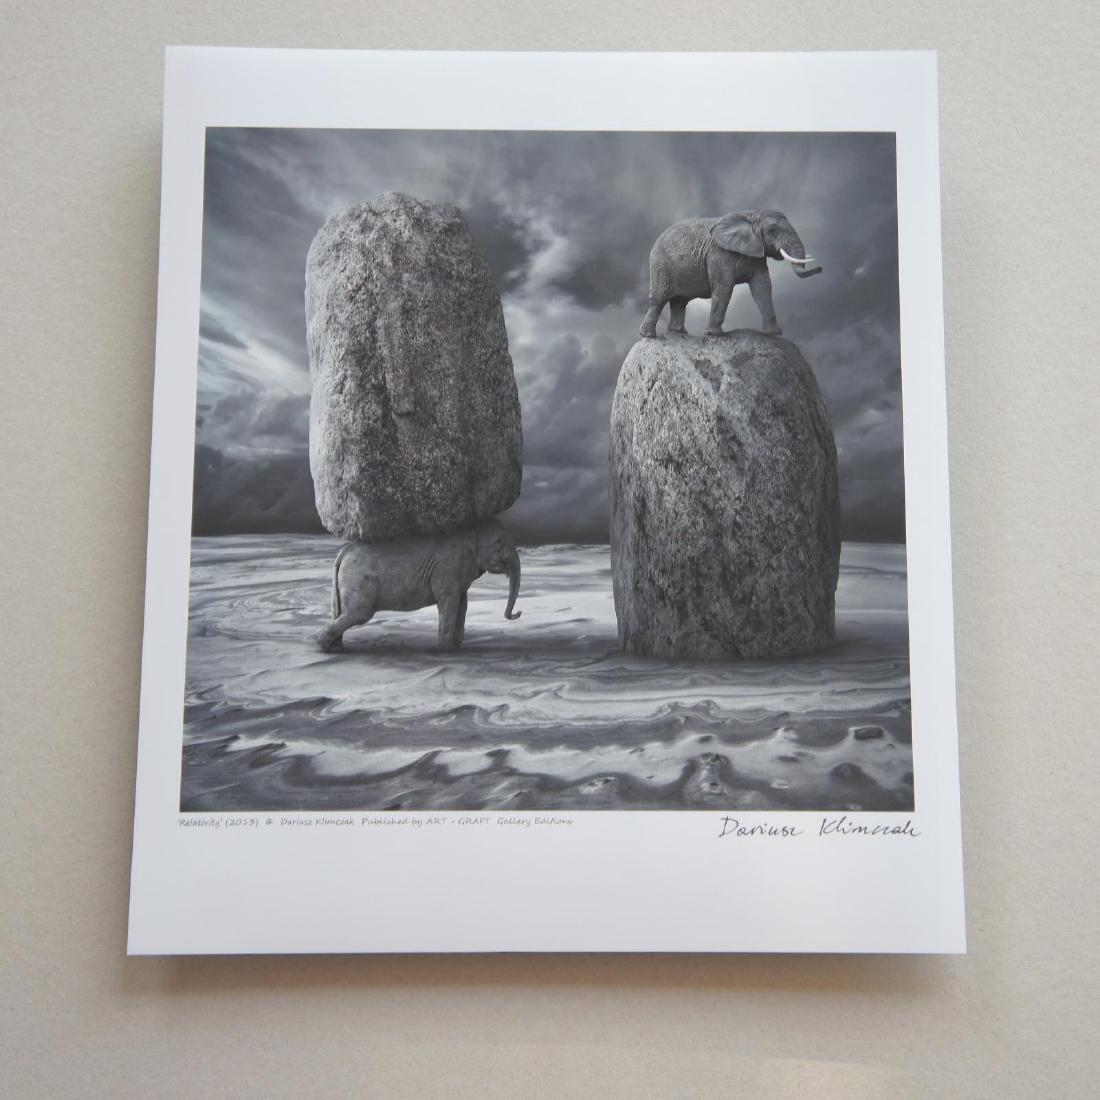 Dariusz Klimczak - Print - Relativity - 2